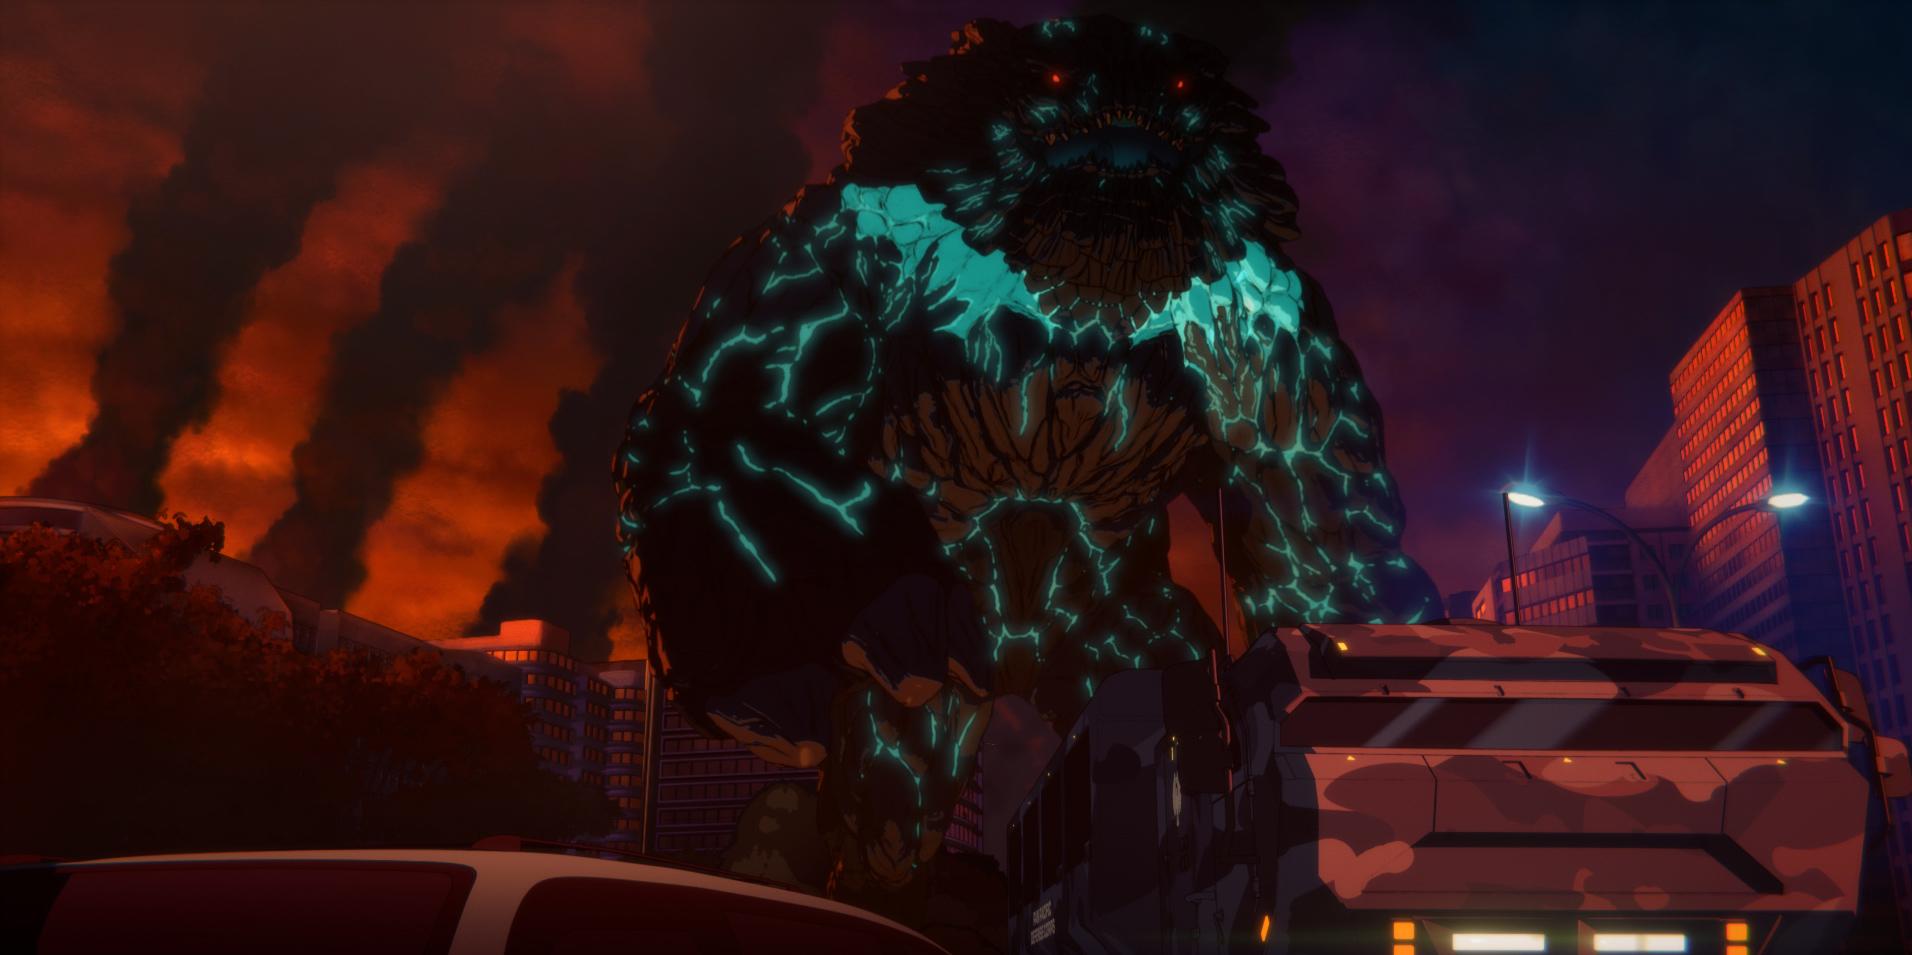 Netflix《环太平洋》动画新剧照发布 2021年上线播出